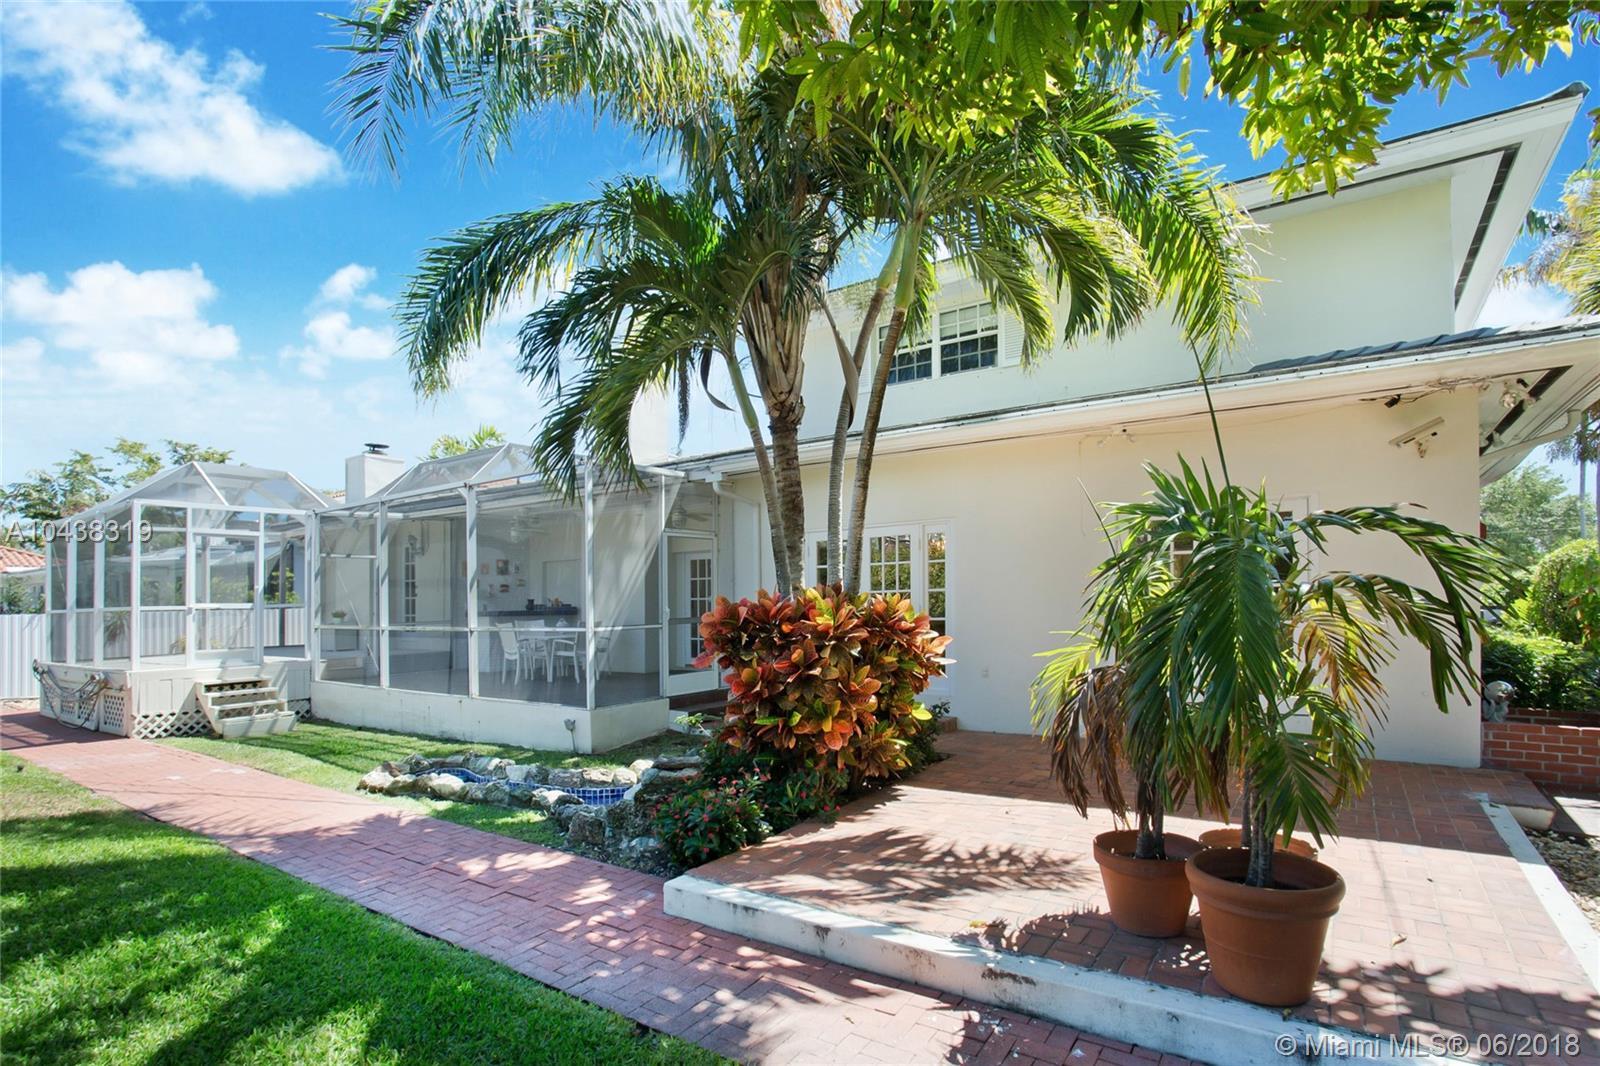 1501 Ne 103rd St, Miami Shores FL, 33138